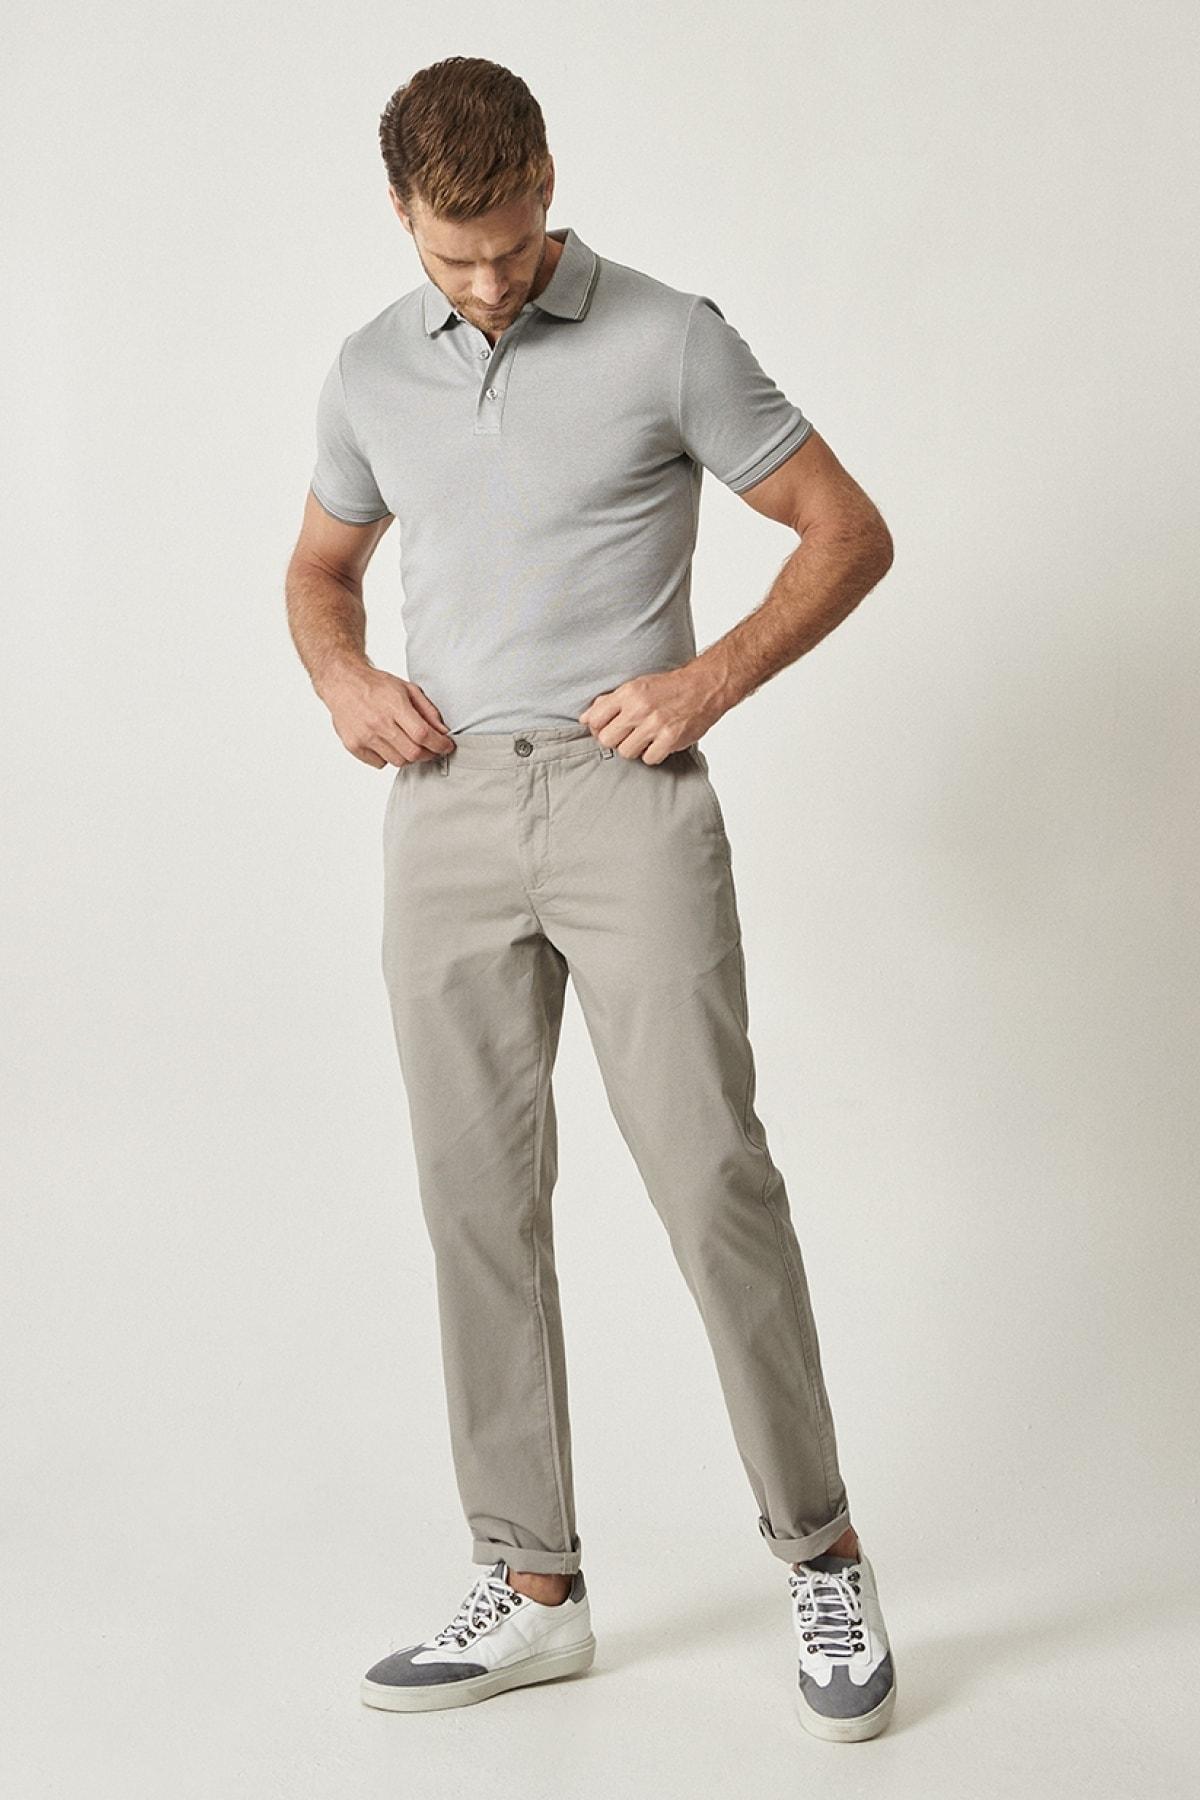 ALTINYILDIZ CLASSICS Erkek Açık Gri Kanvas Slim Fit Chino Pantolon 2